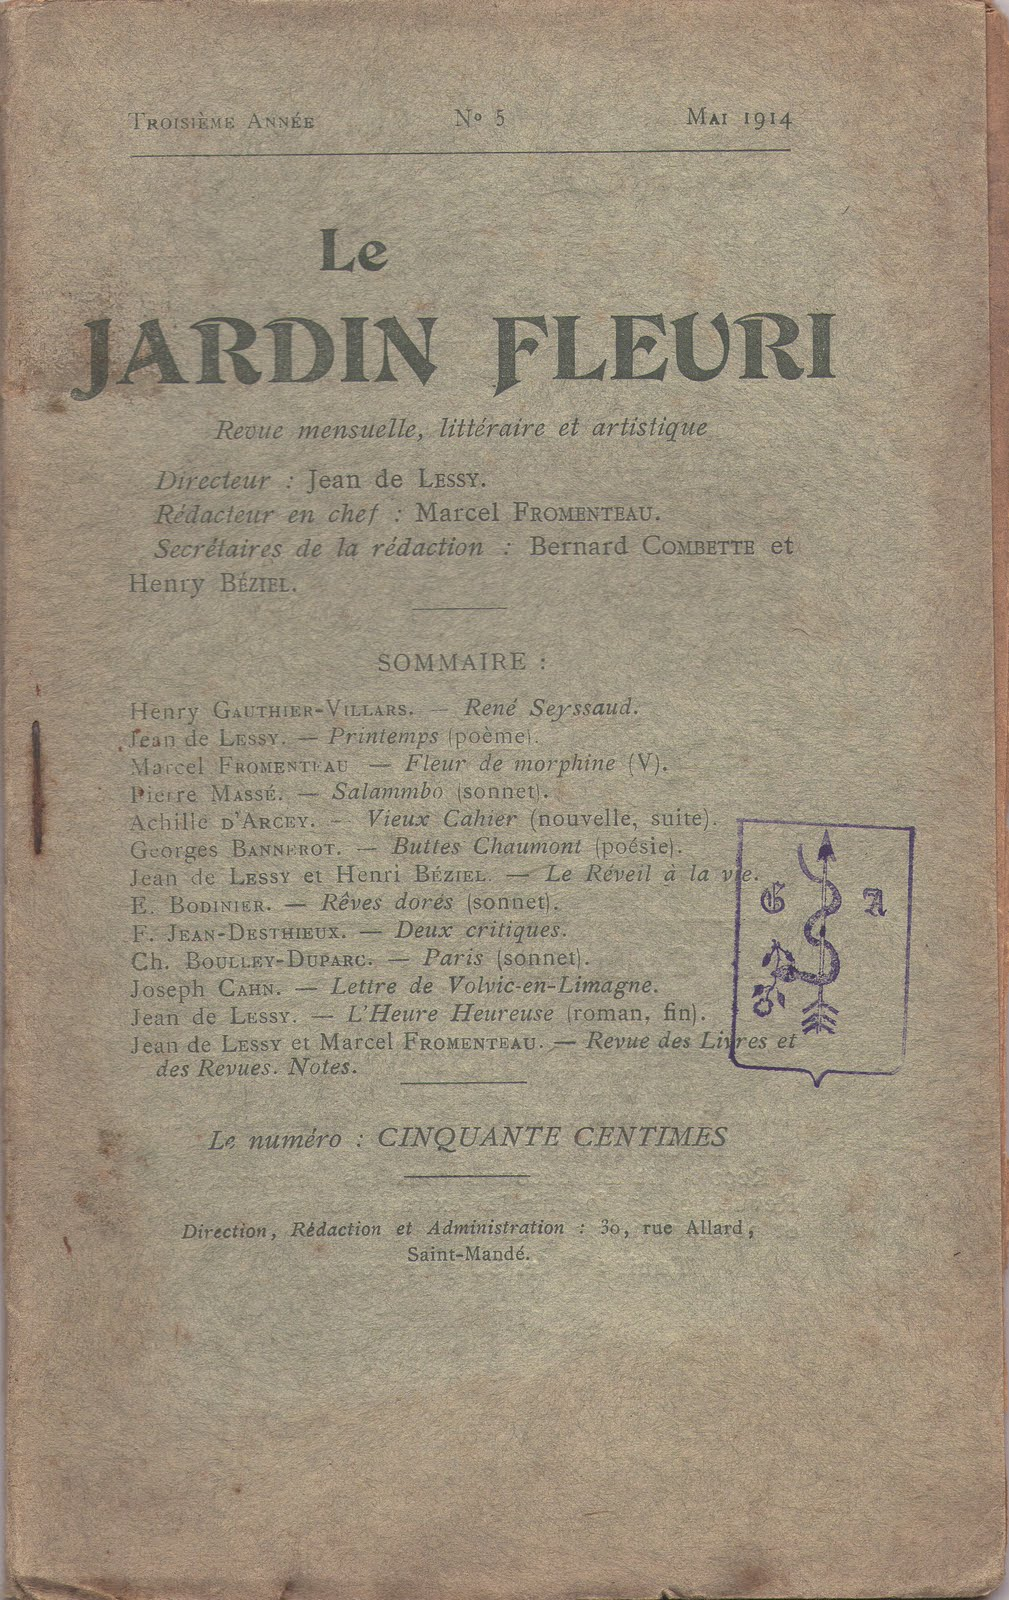 Livrenblog le jardin fleuri r seyssaud par h gauthier for Jardin fleuri lyon 9